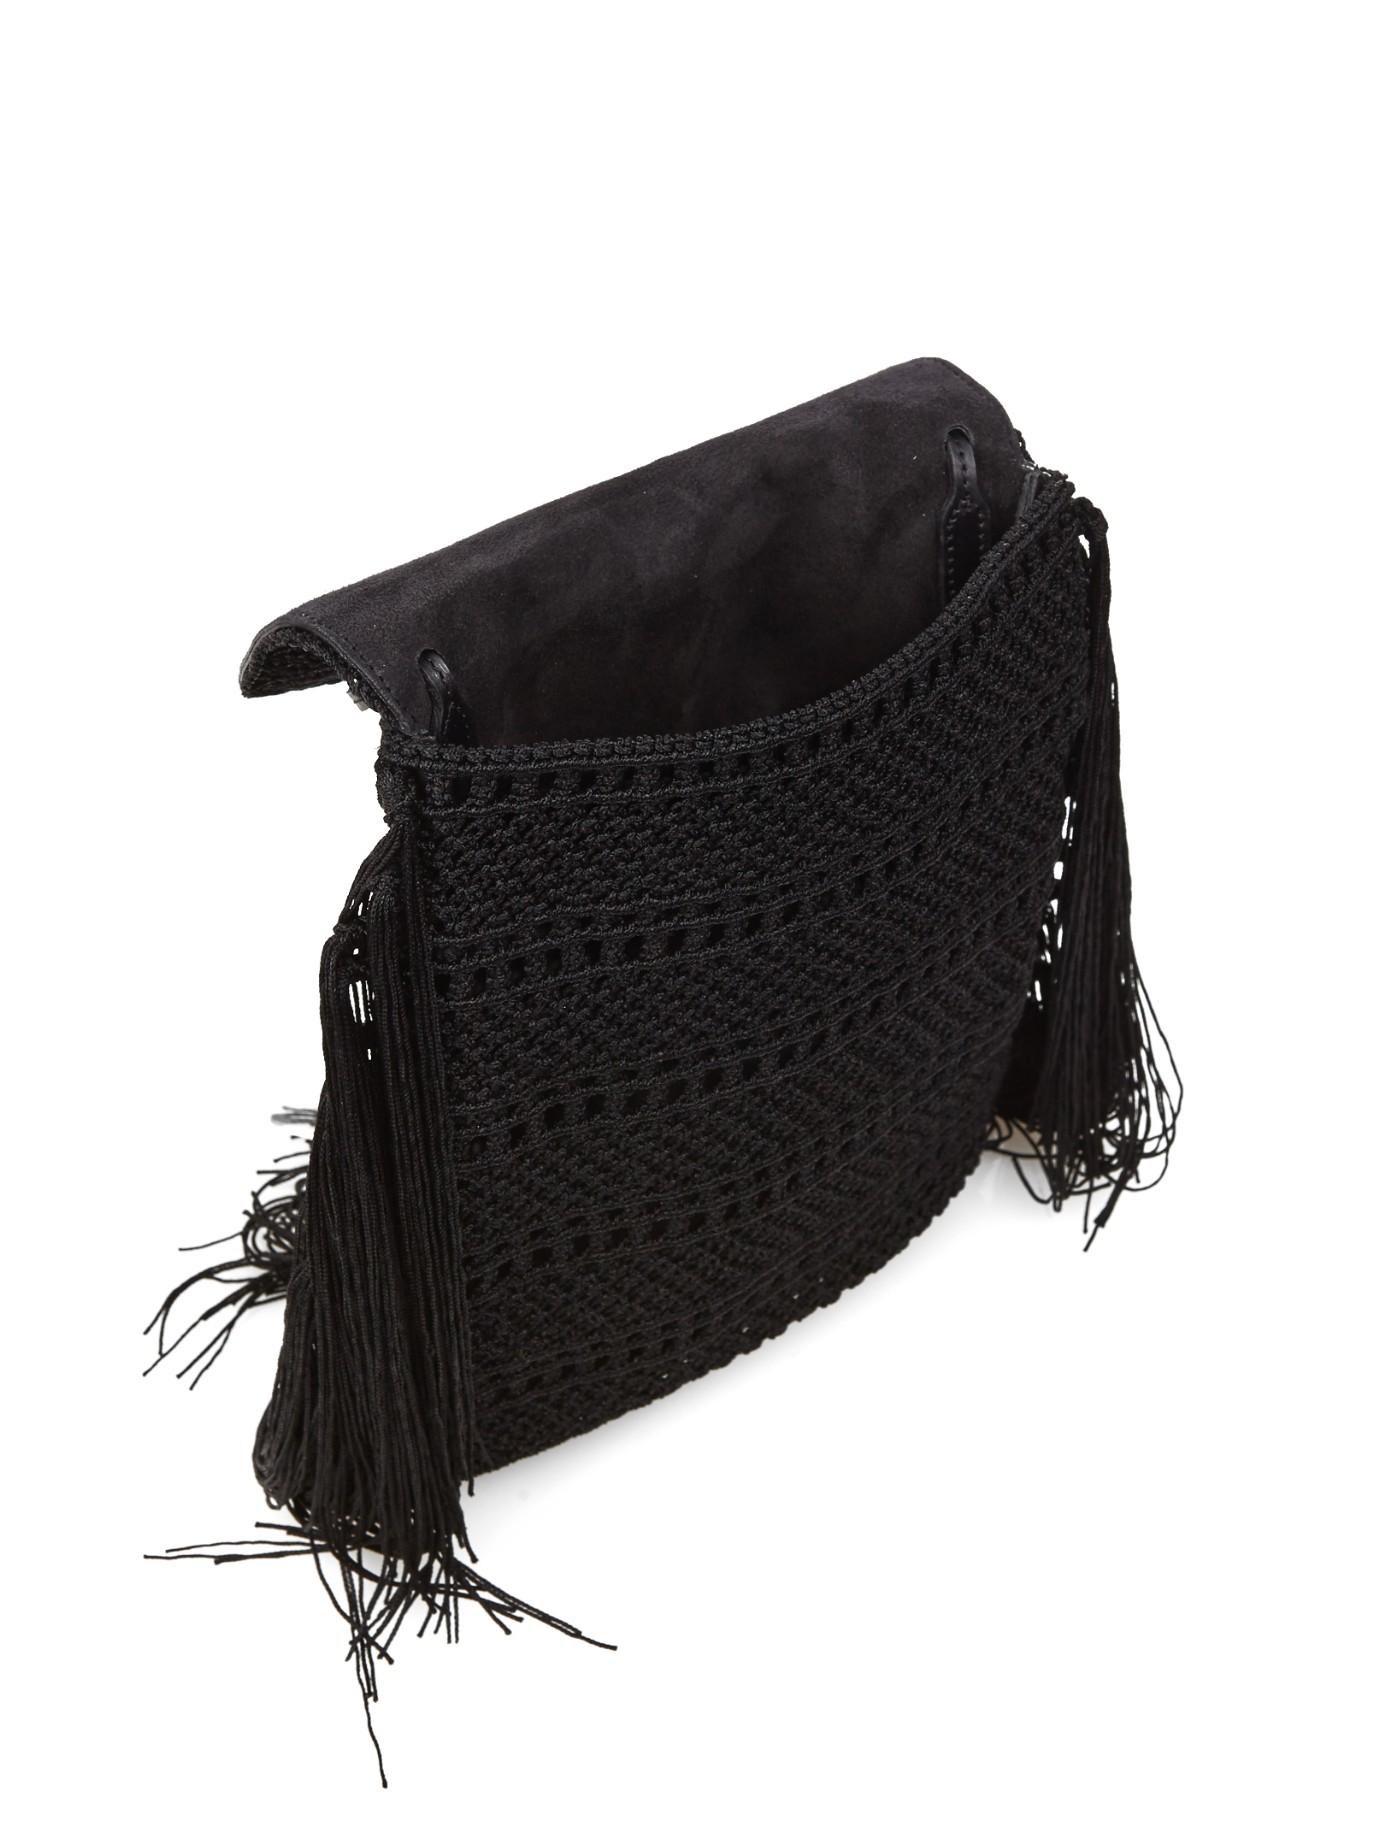 y bag yves saint laurent - monogram baby chain serpent crossbody bag, black